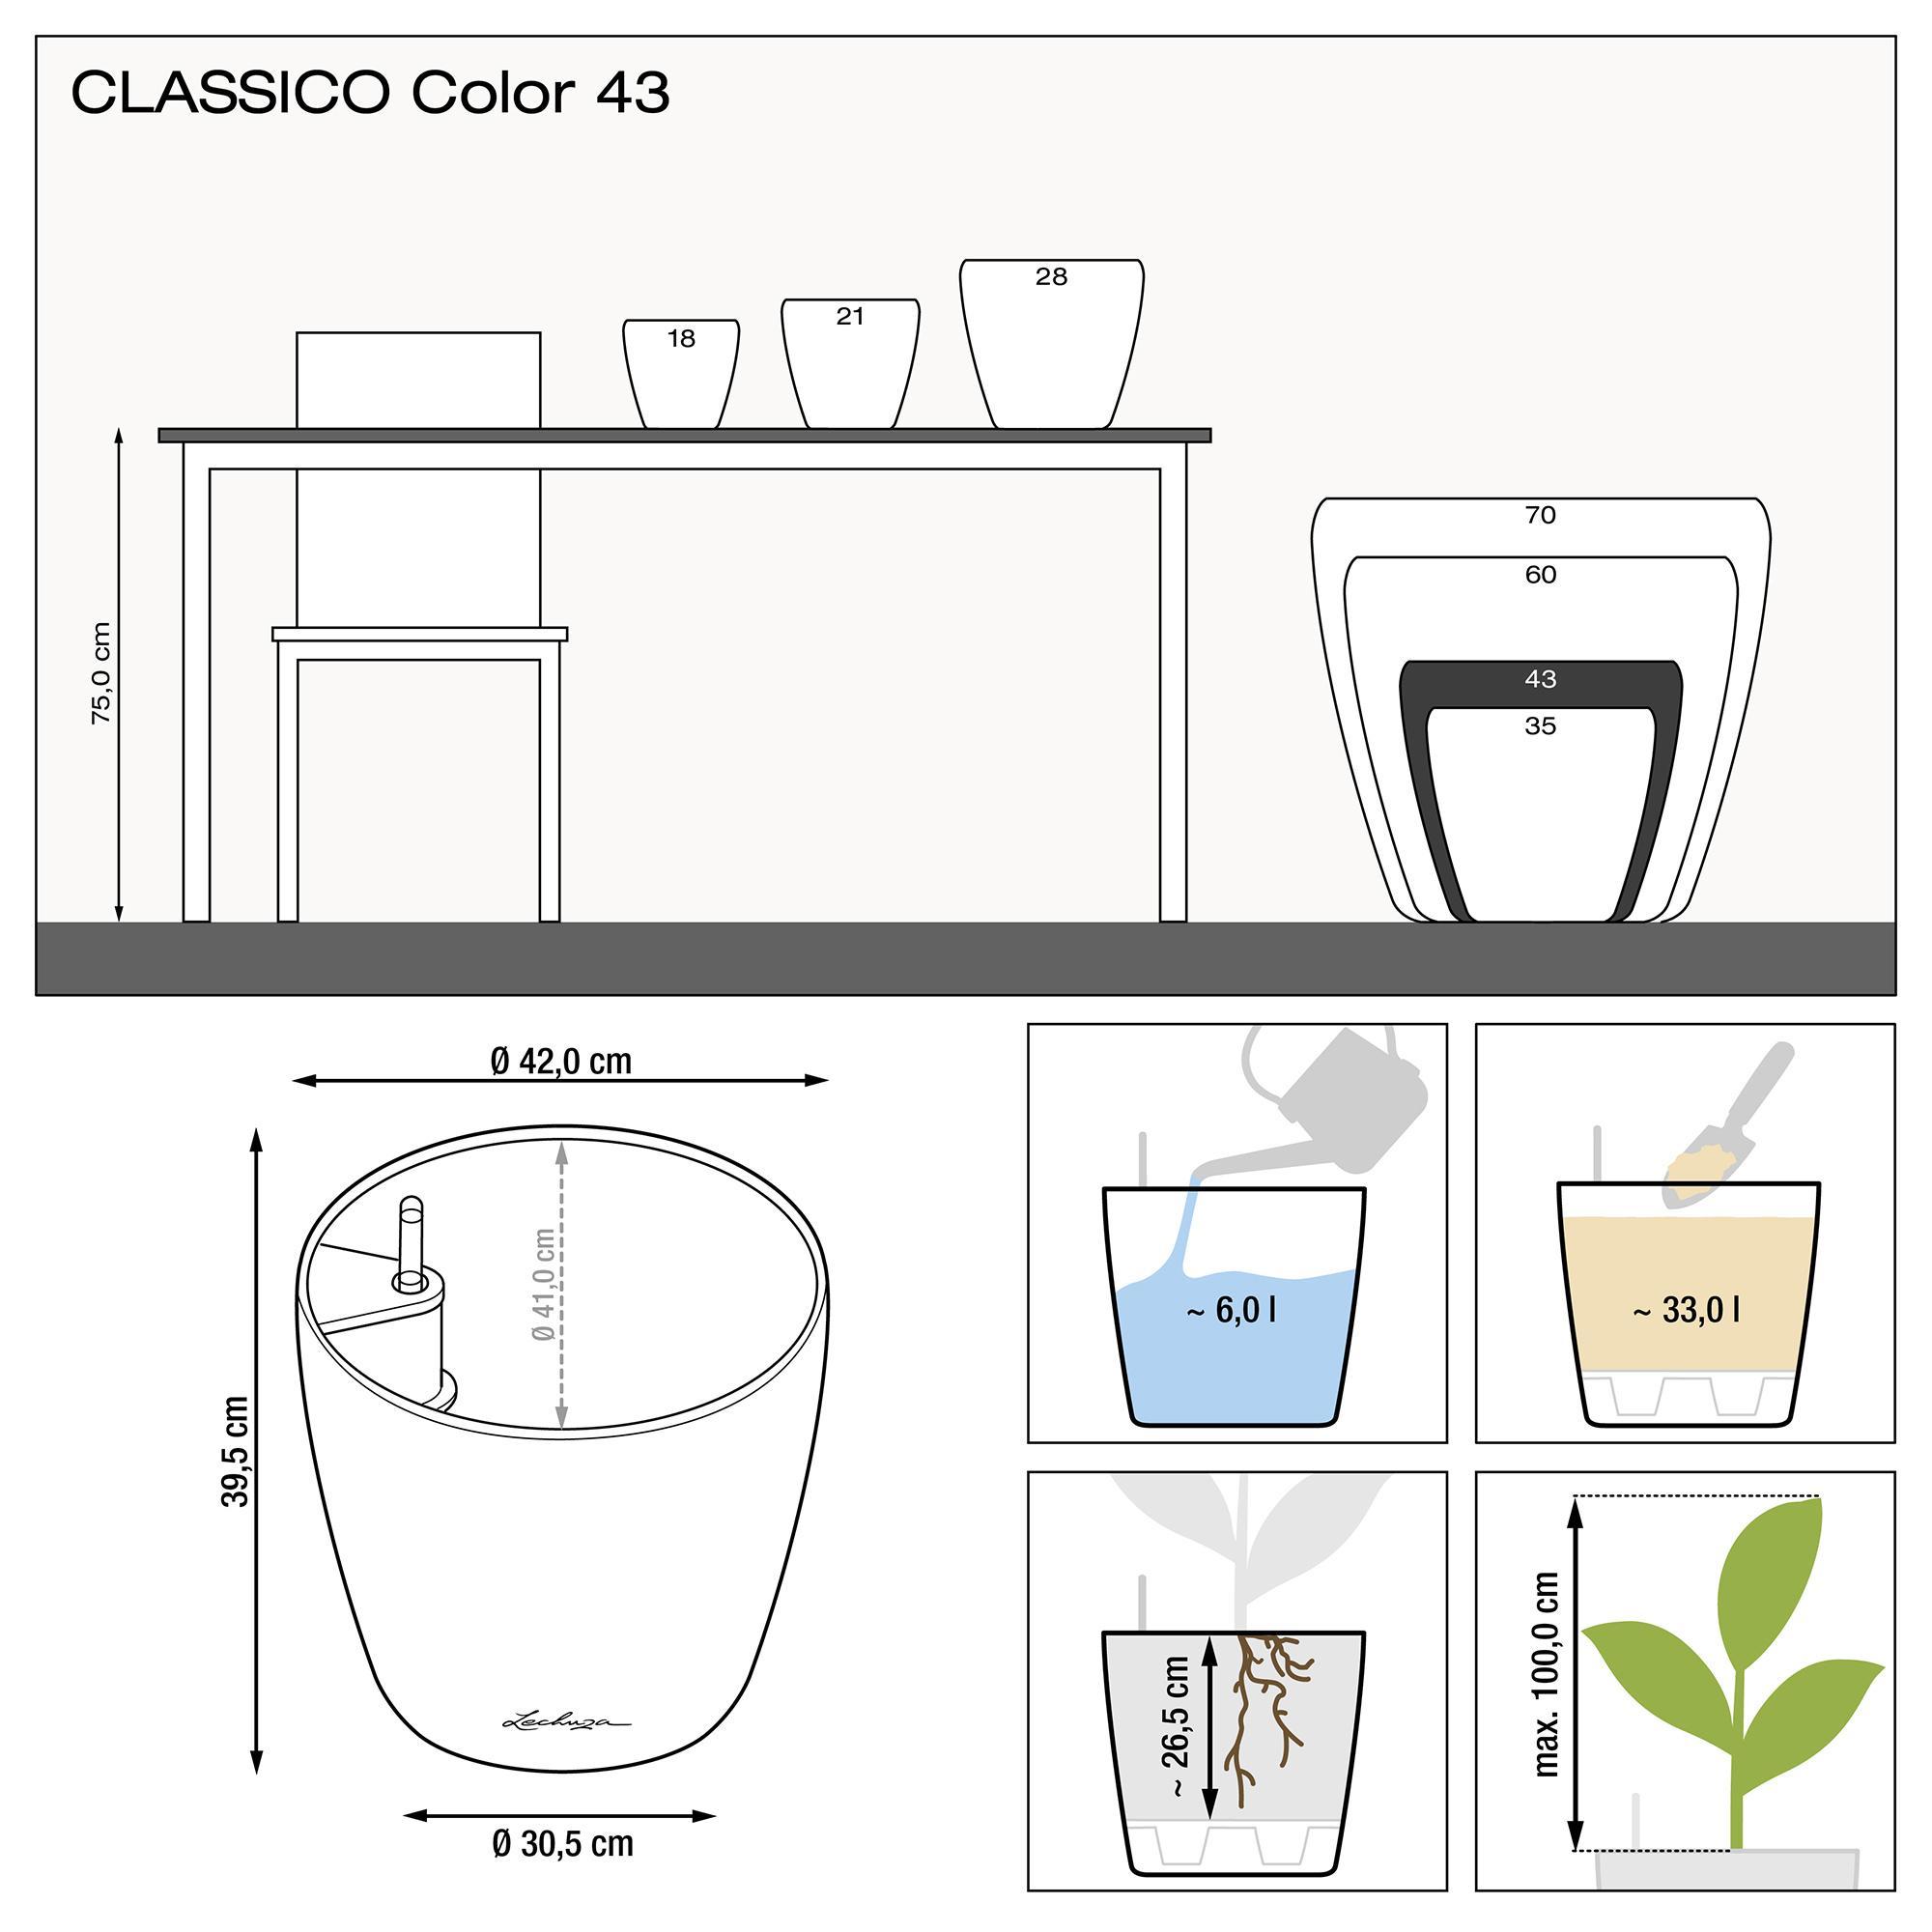 CLASSICO Color 43 schiefergrau - Bild 2